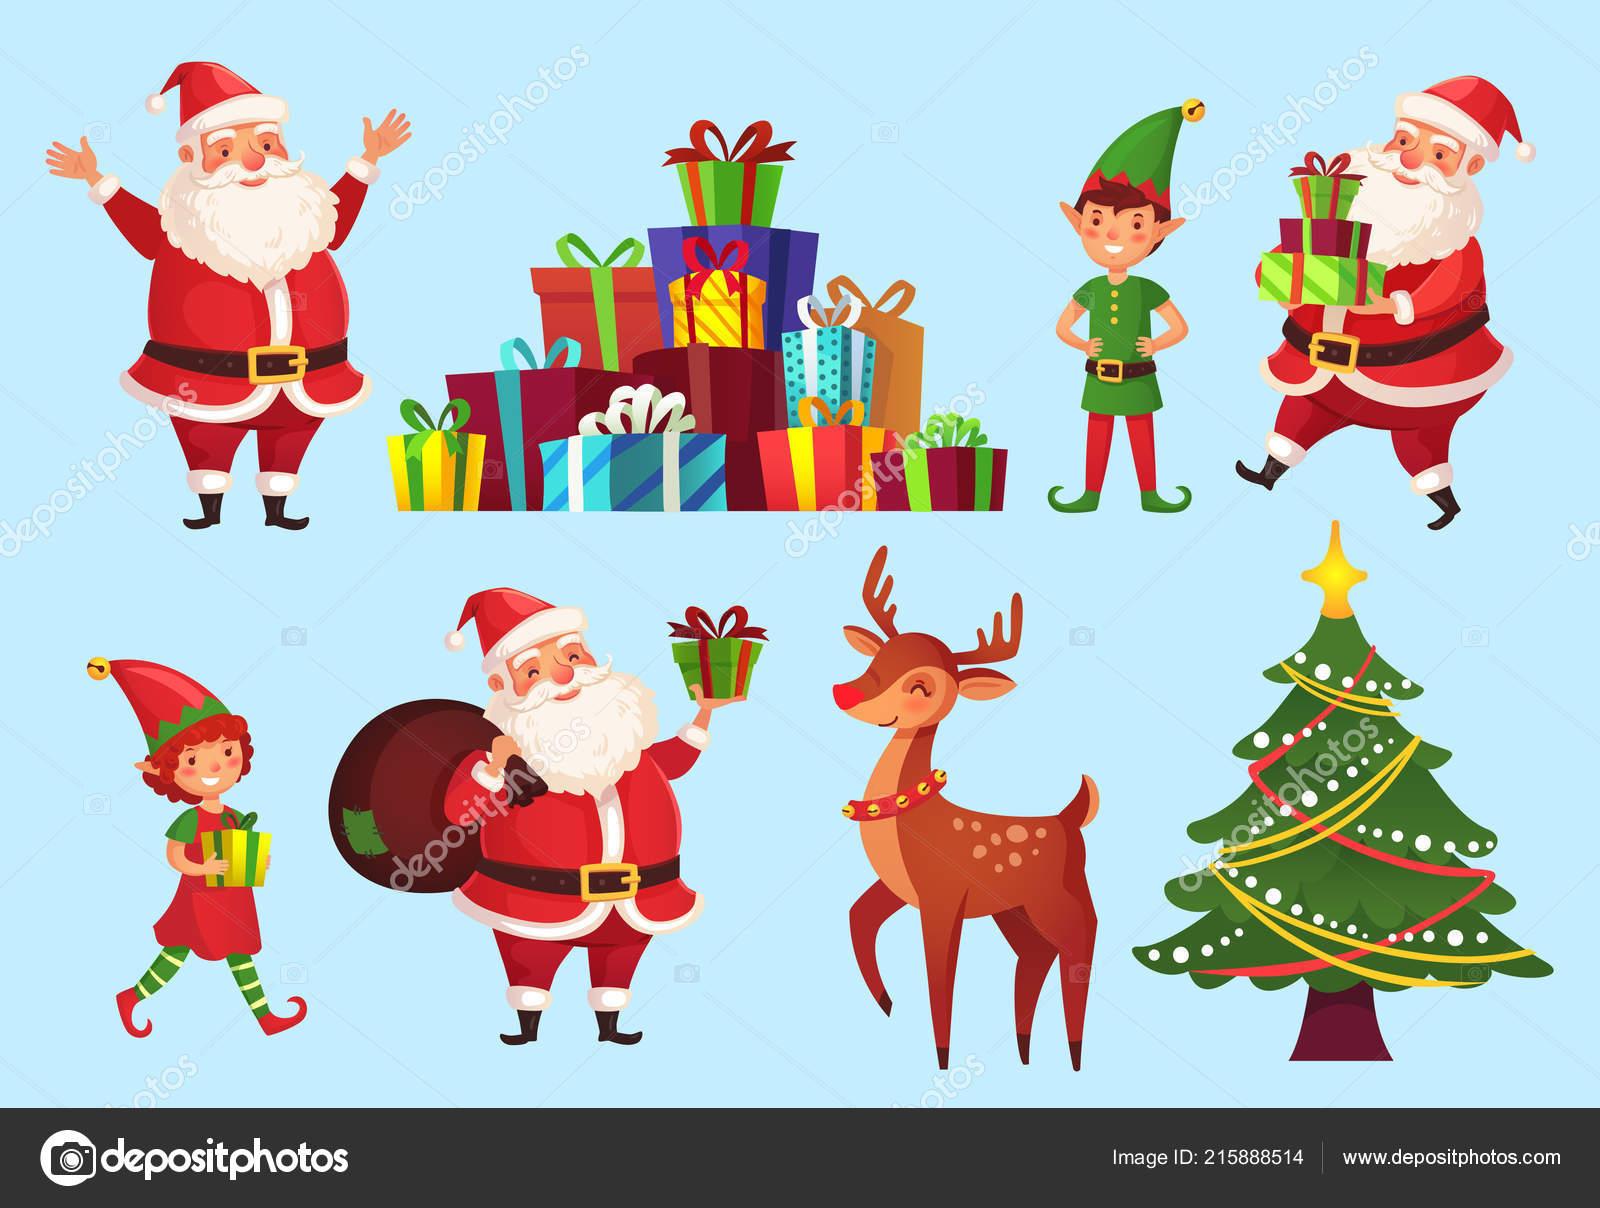 Comic Bilder Weihnachten.Comic Figuren Weihnachten Weihnachtsbaum Mit Weihnachtsmann